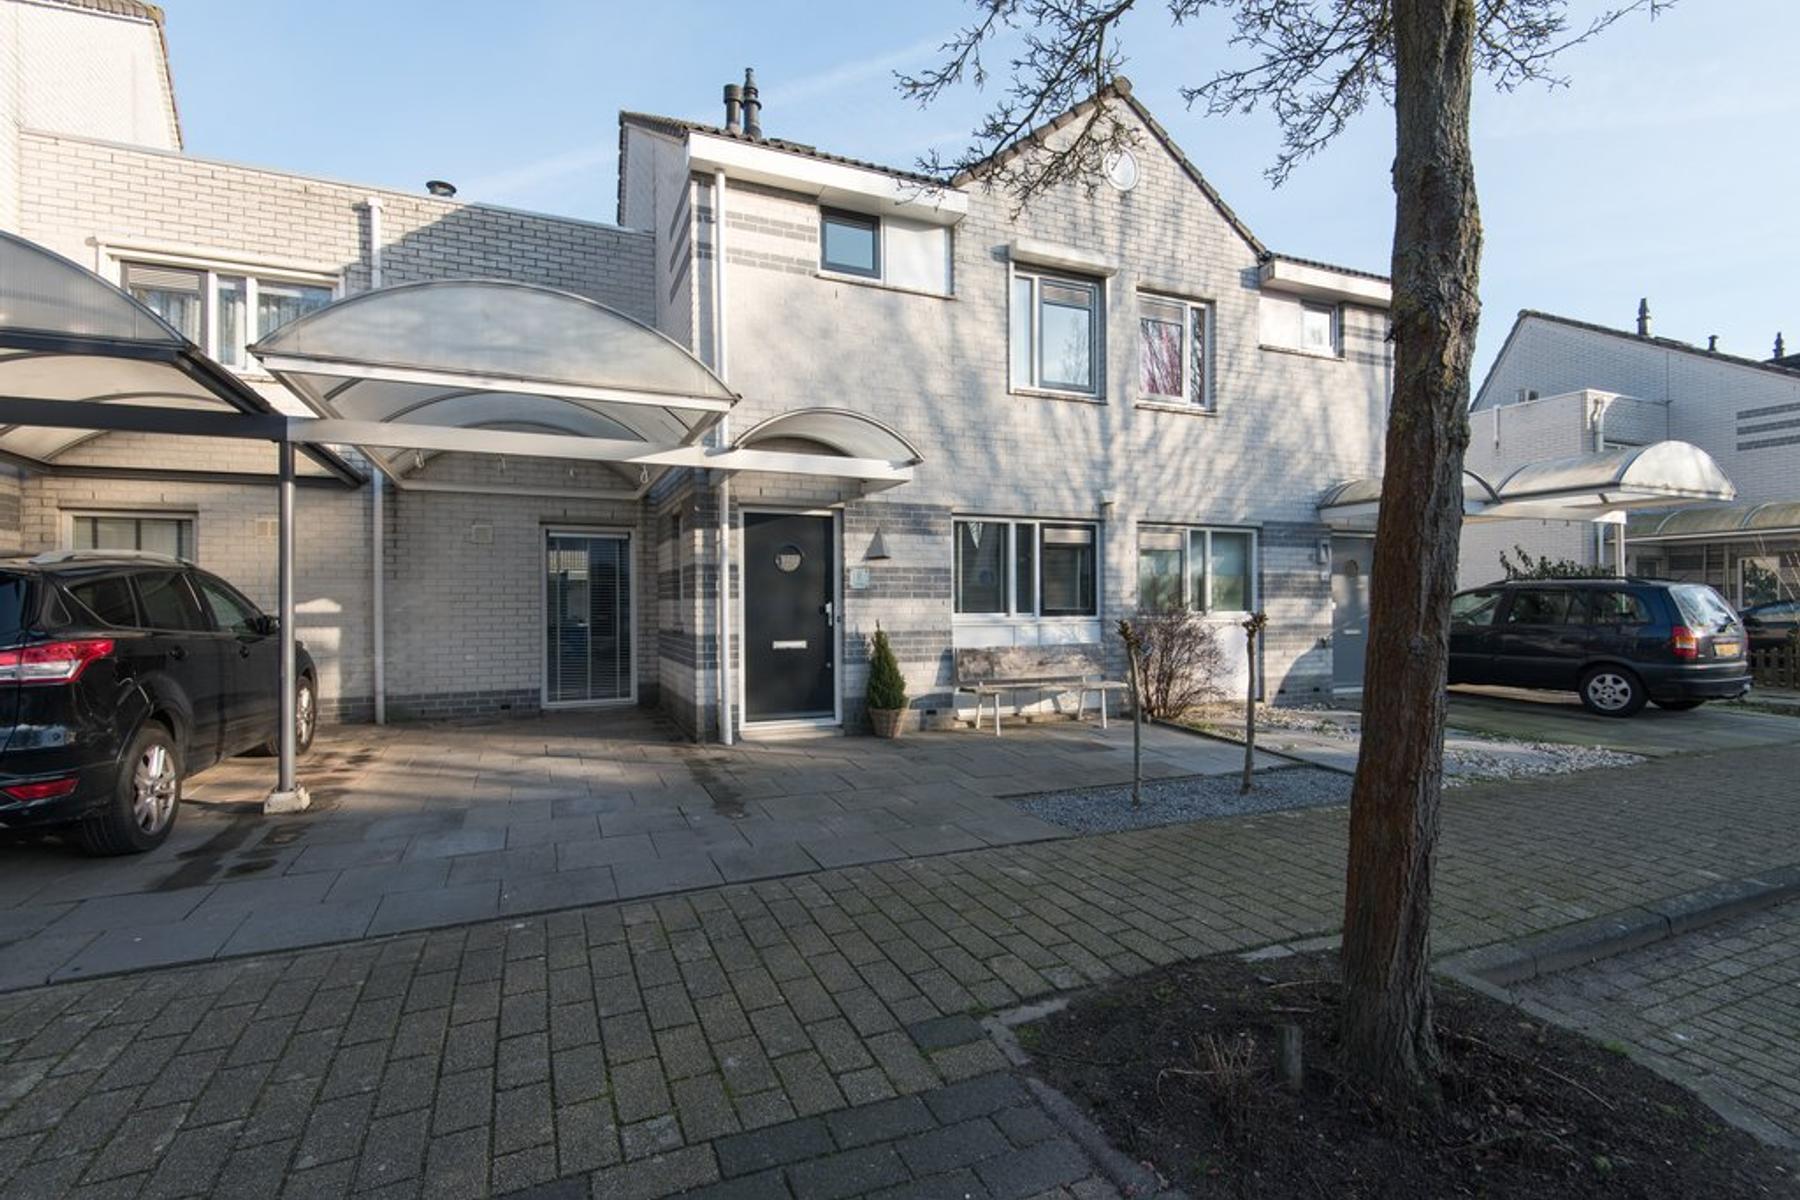 Dr. J.M. Den Uylstraat 16 in Gorinchem 4207 NK